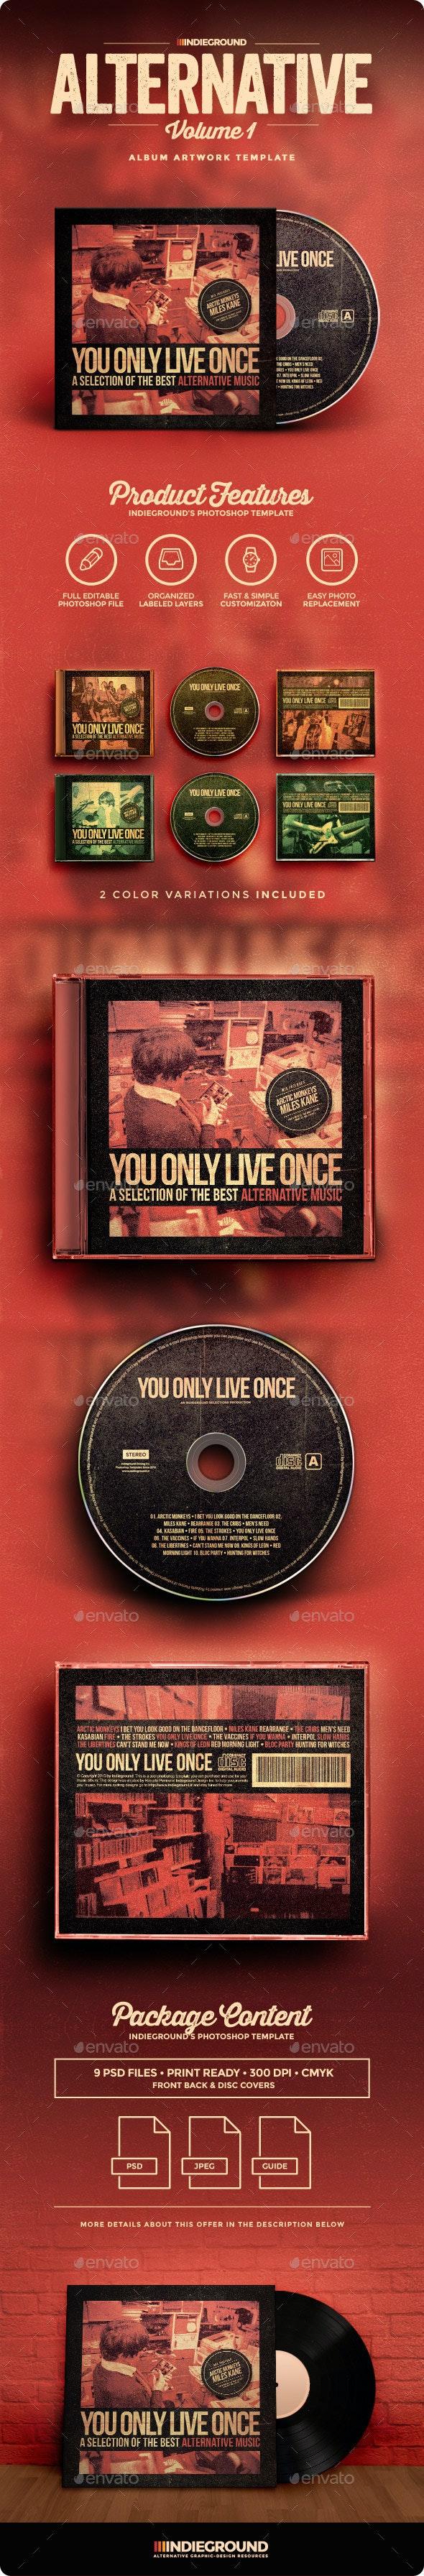 Alternative CD Album Artwork - CD & DVD Artwork Print Templates